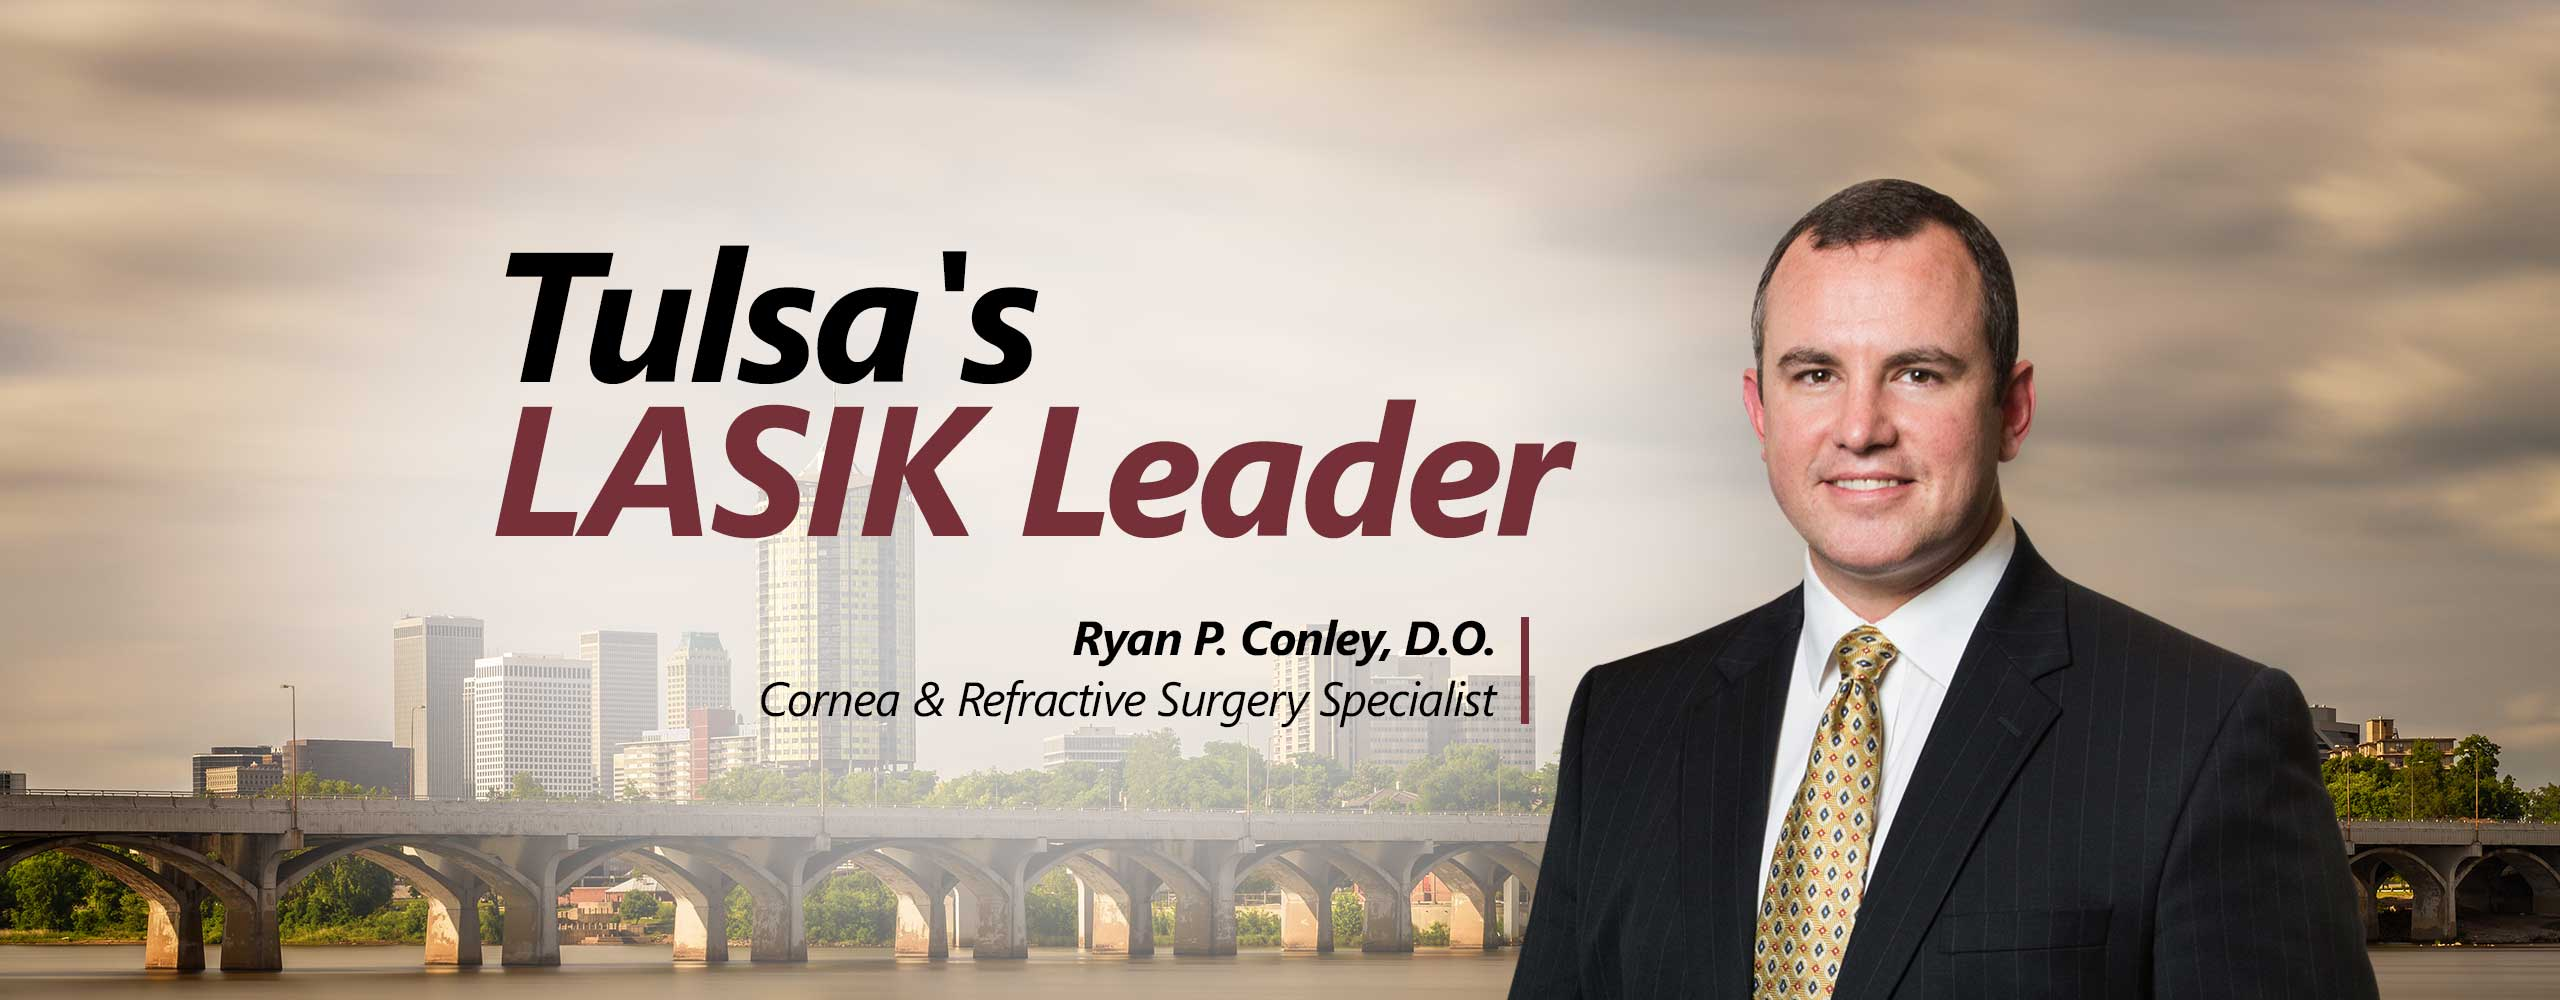 Ryan P. Conley, D.O. | iLASIK Blade-Free Vision Correction Surgery